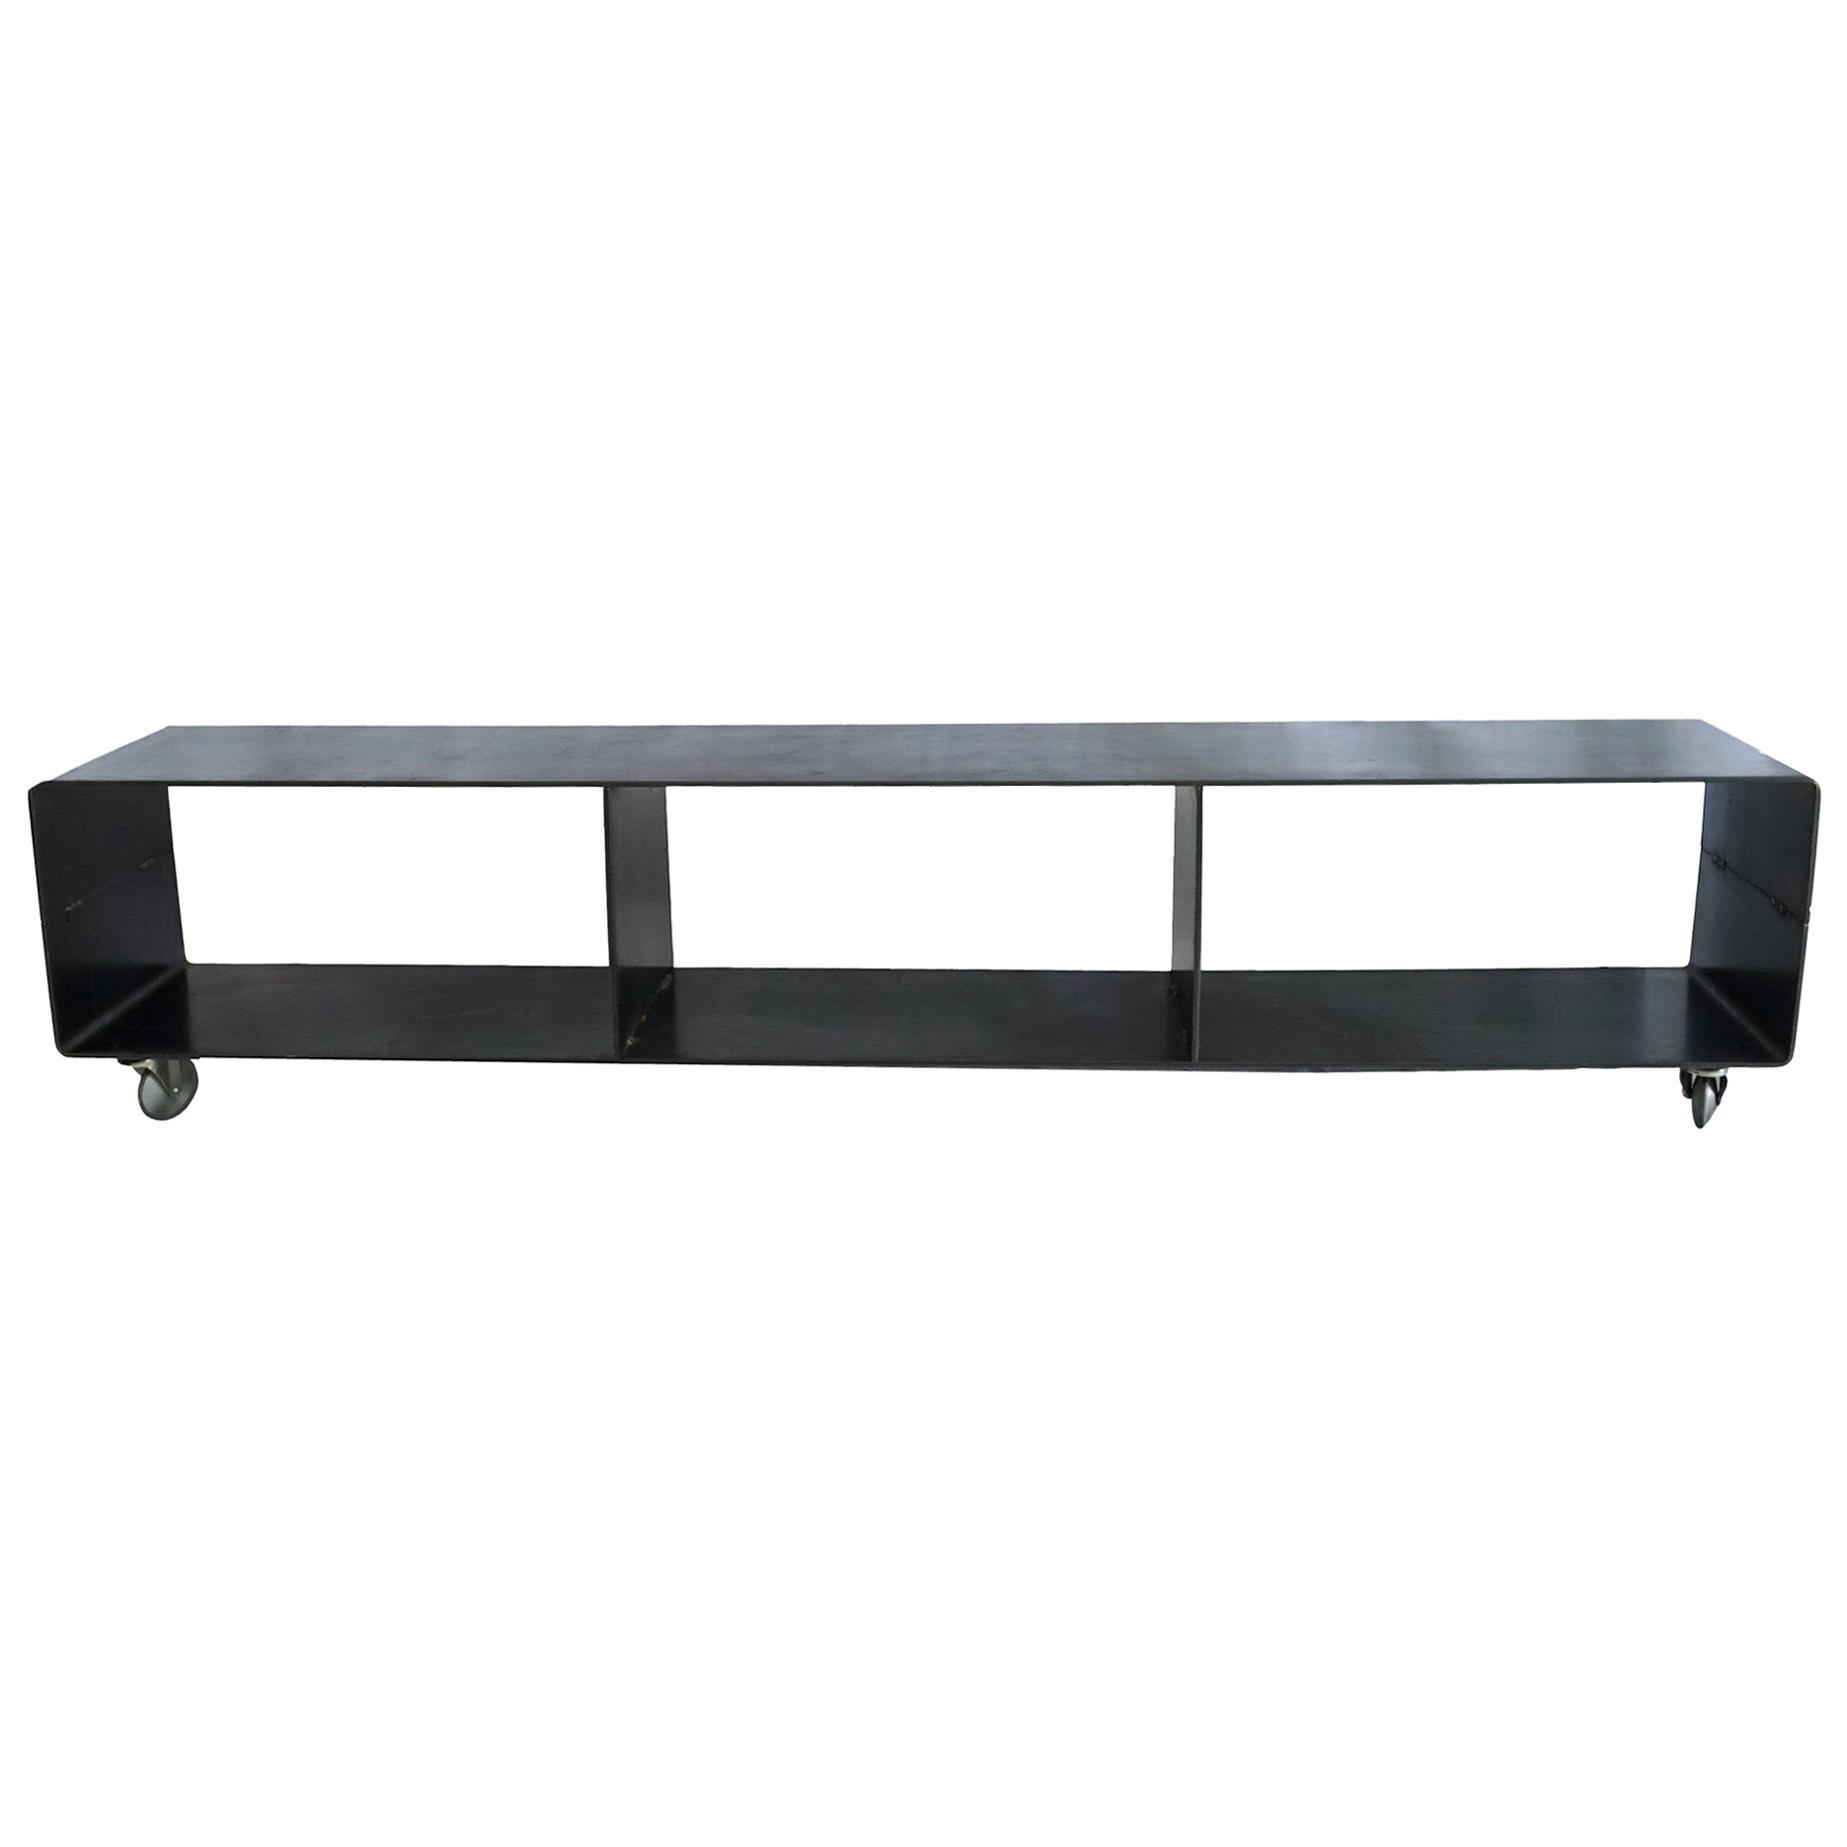 J3 Blackened Steel Bookcase by Edelman New York